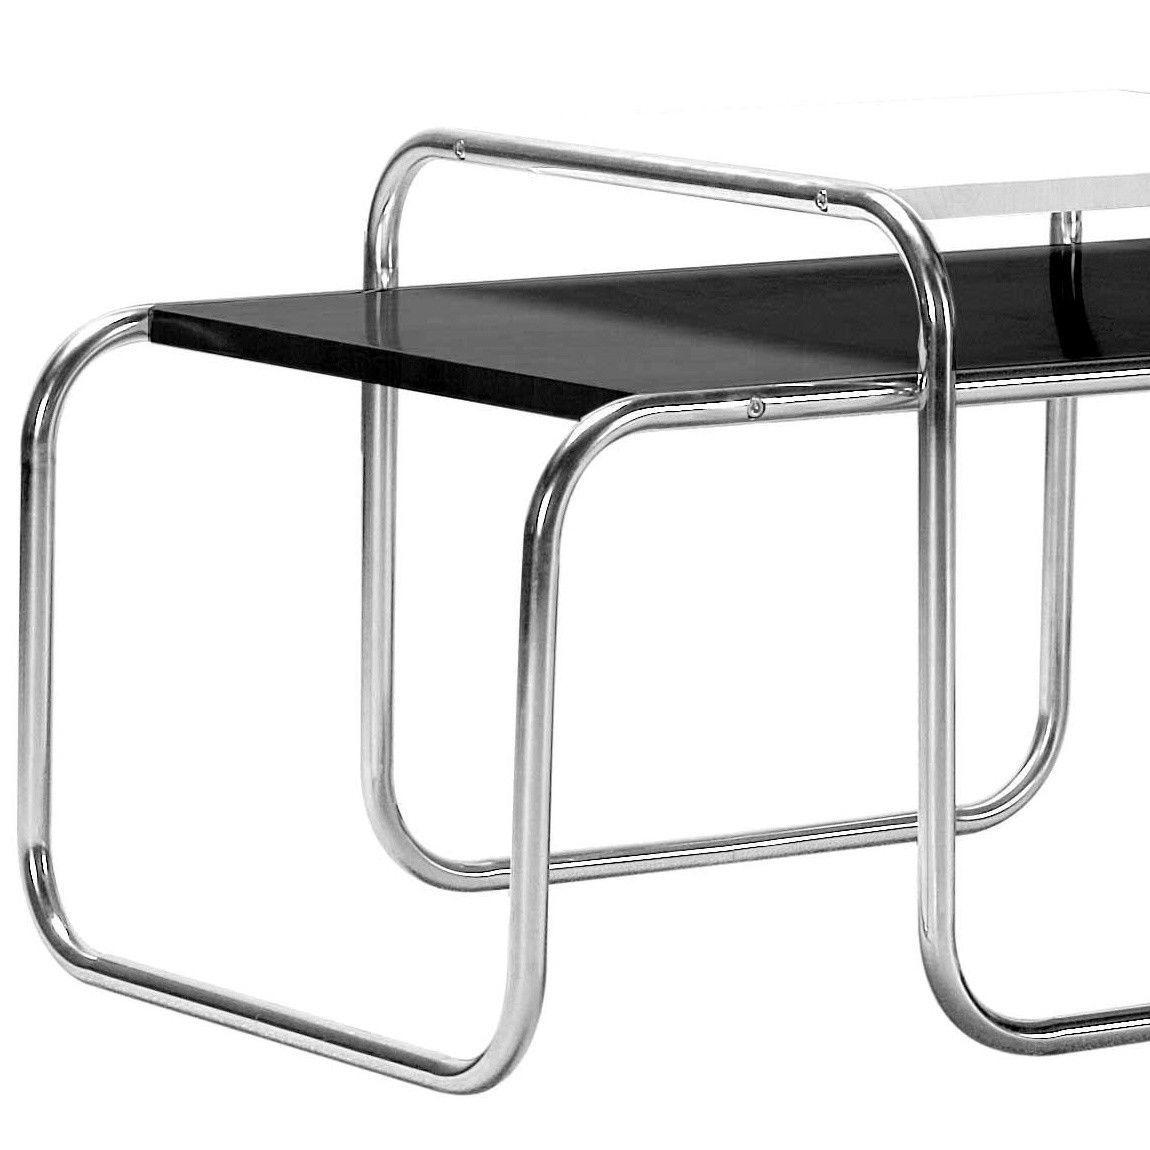 laccio couchtisch quadratisch knoll international. Black Bedroom Furniture Sets. Home Design Ideas